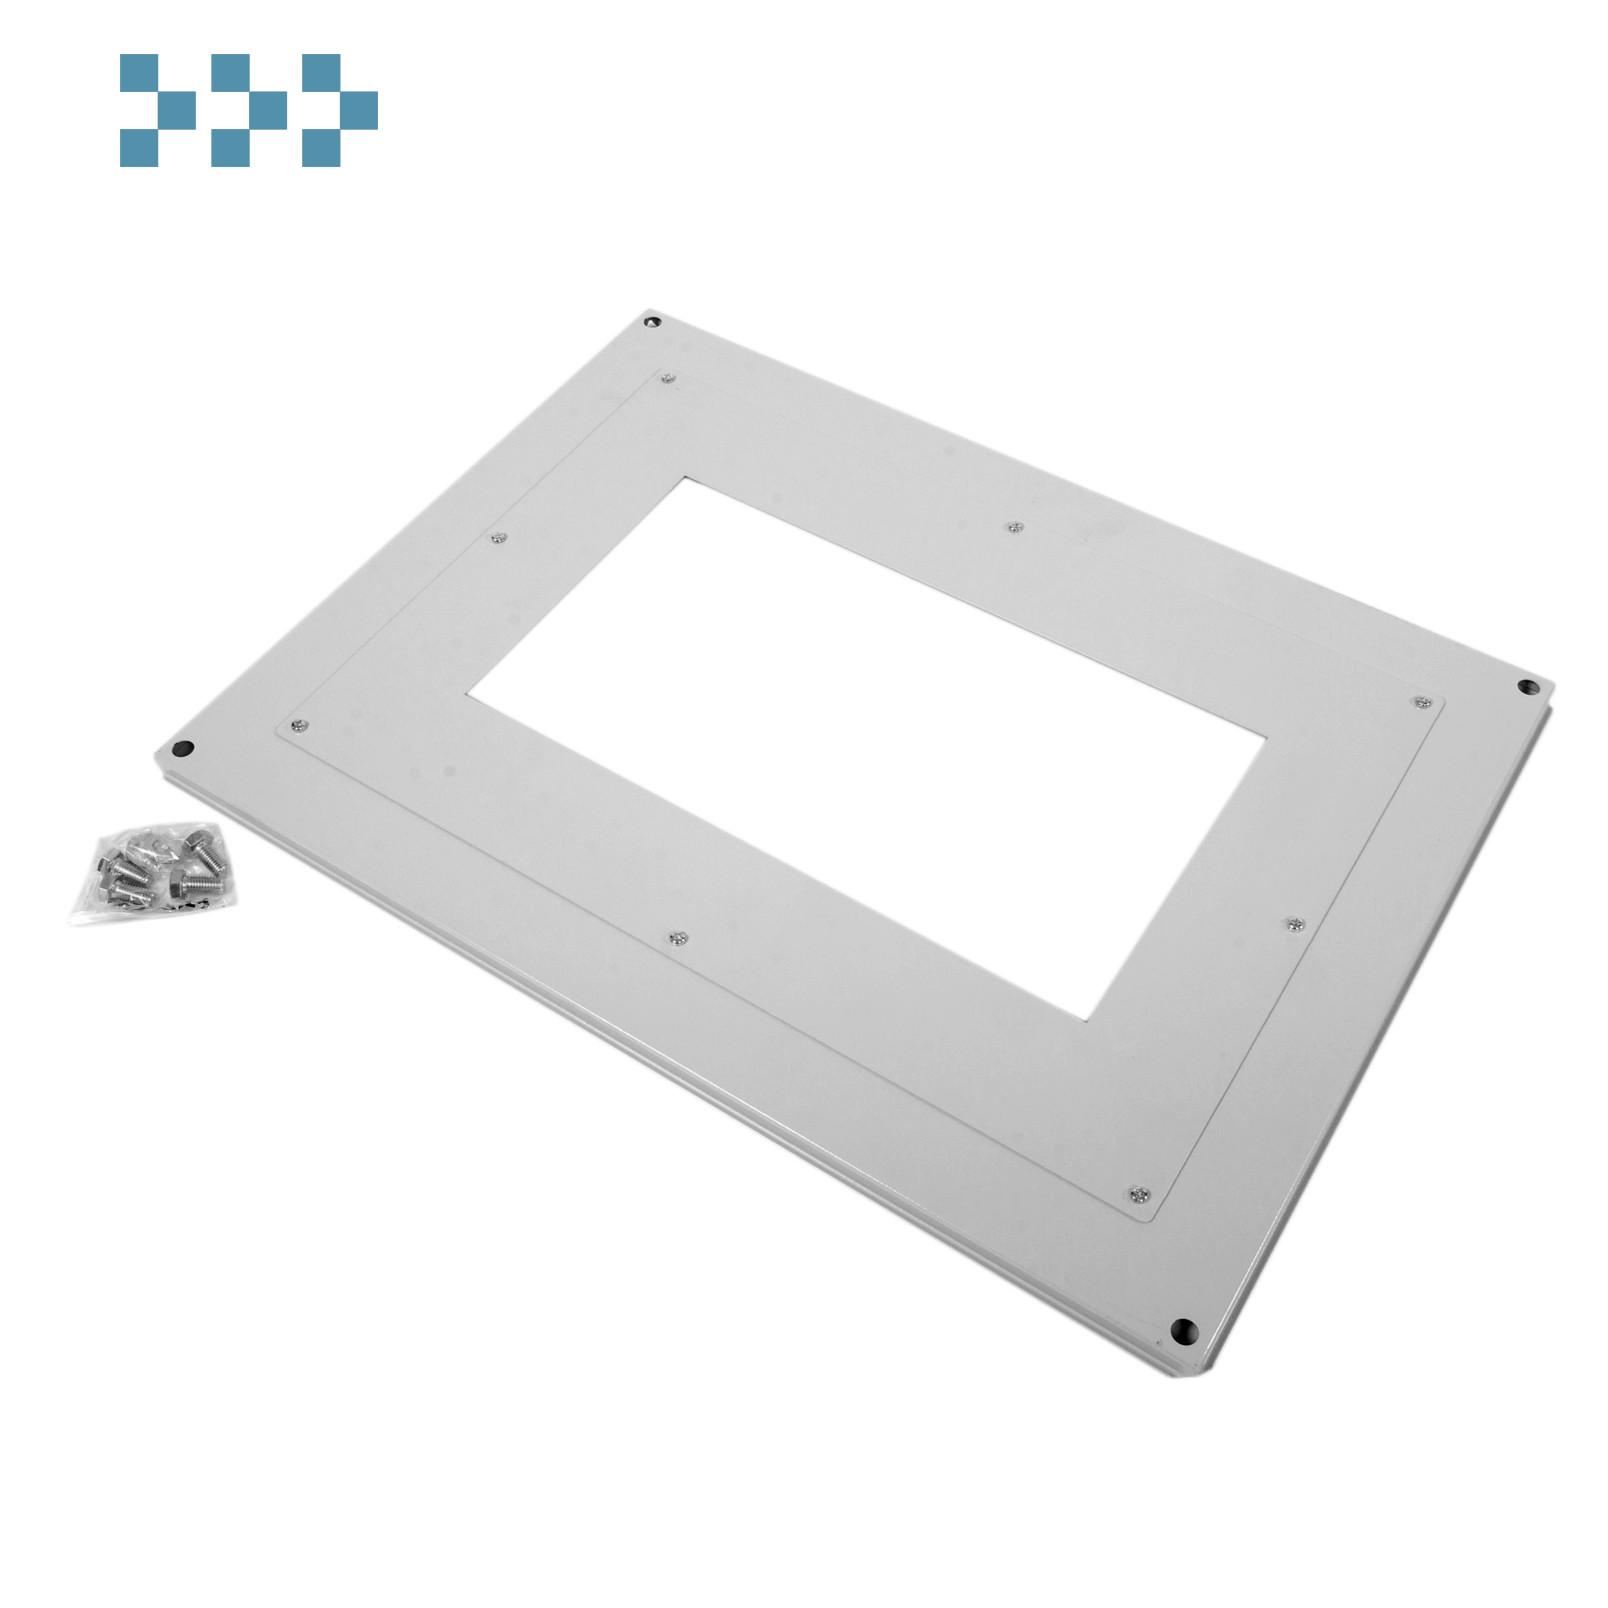 Крыша для монтажа кондиционера Pfannenberg DTT Elbox EMS-RC-800.800